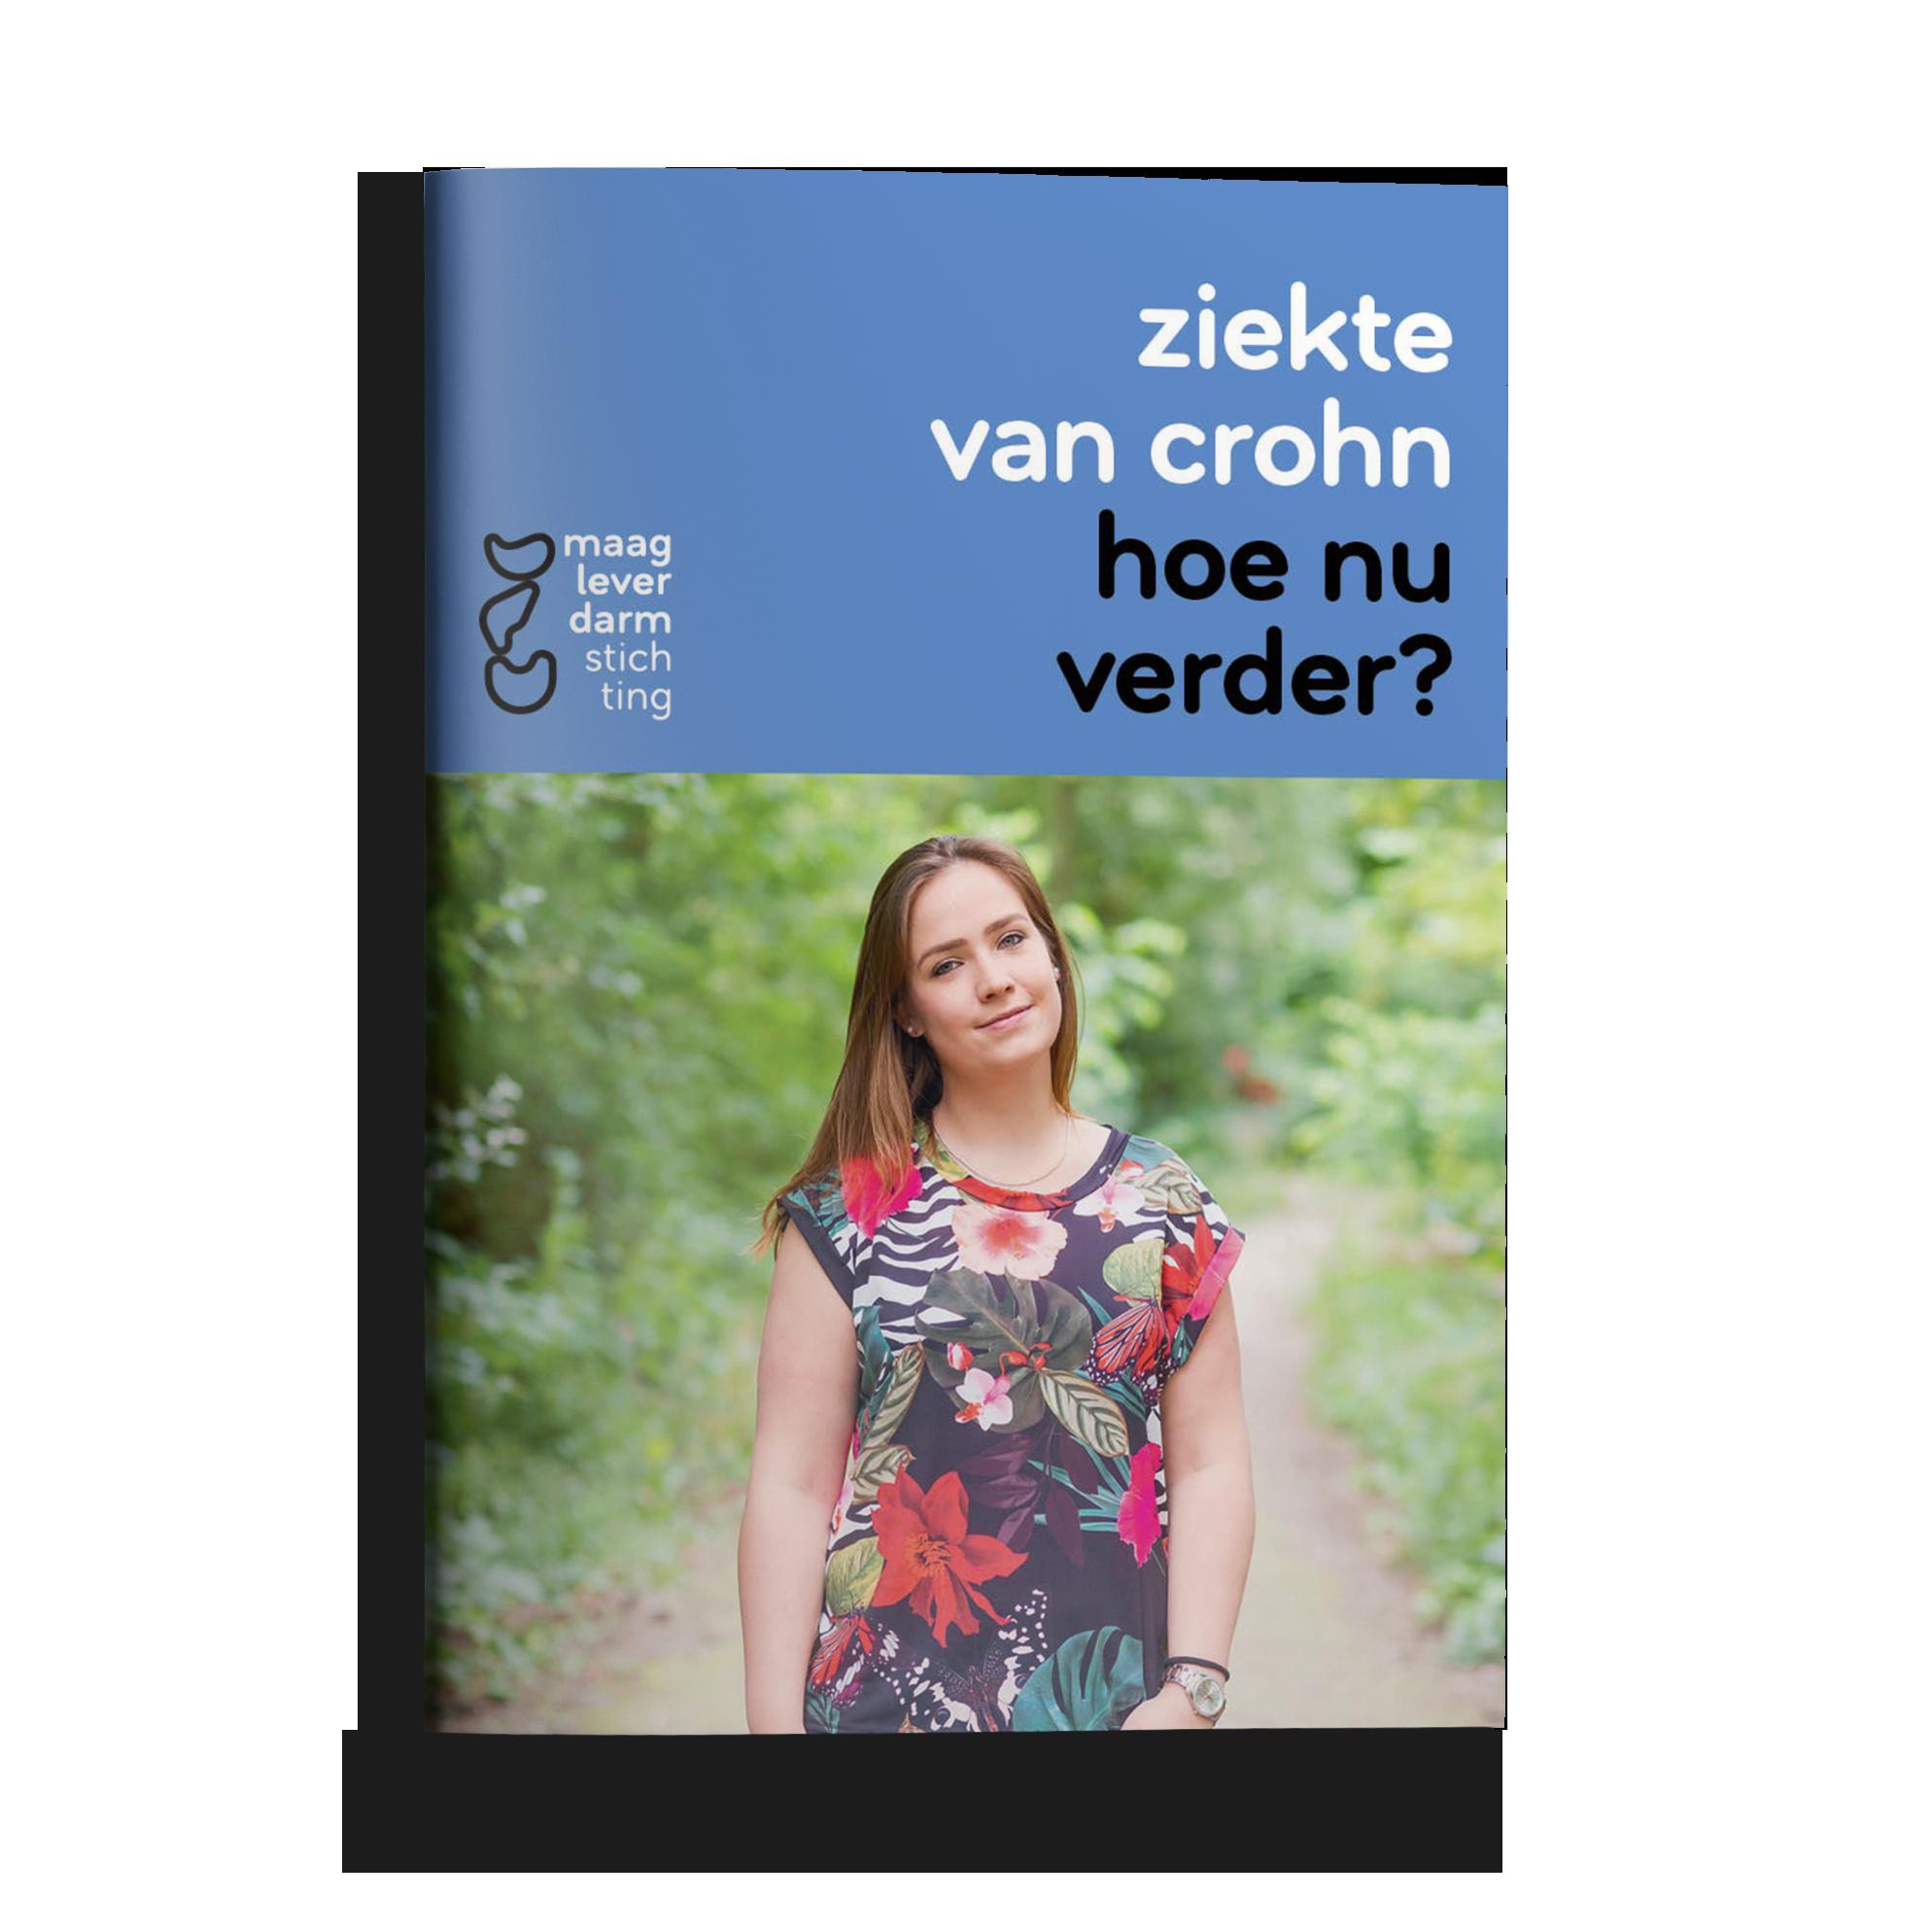 https://www.mlds.nl/content/uploads/Mockup_Crohn.png